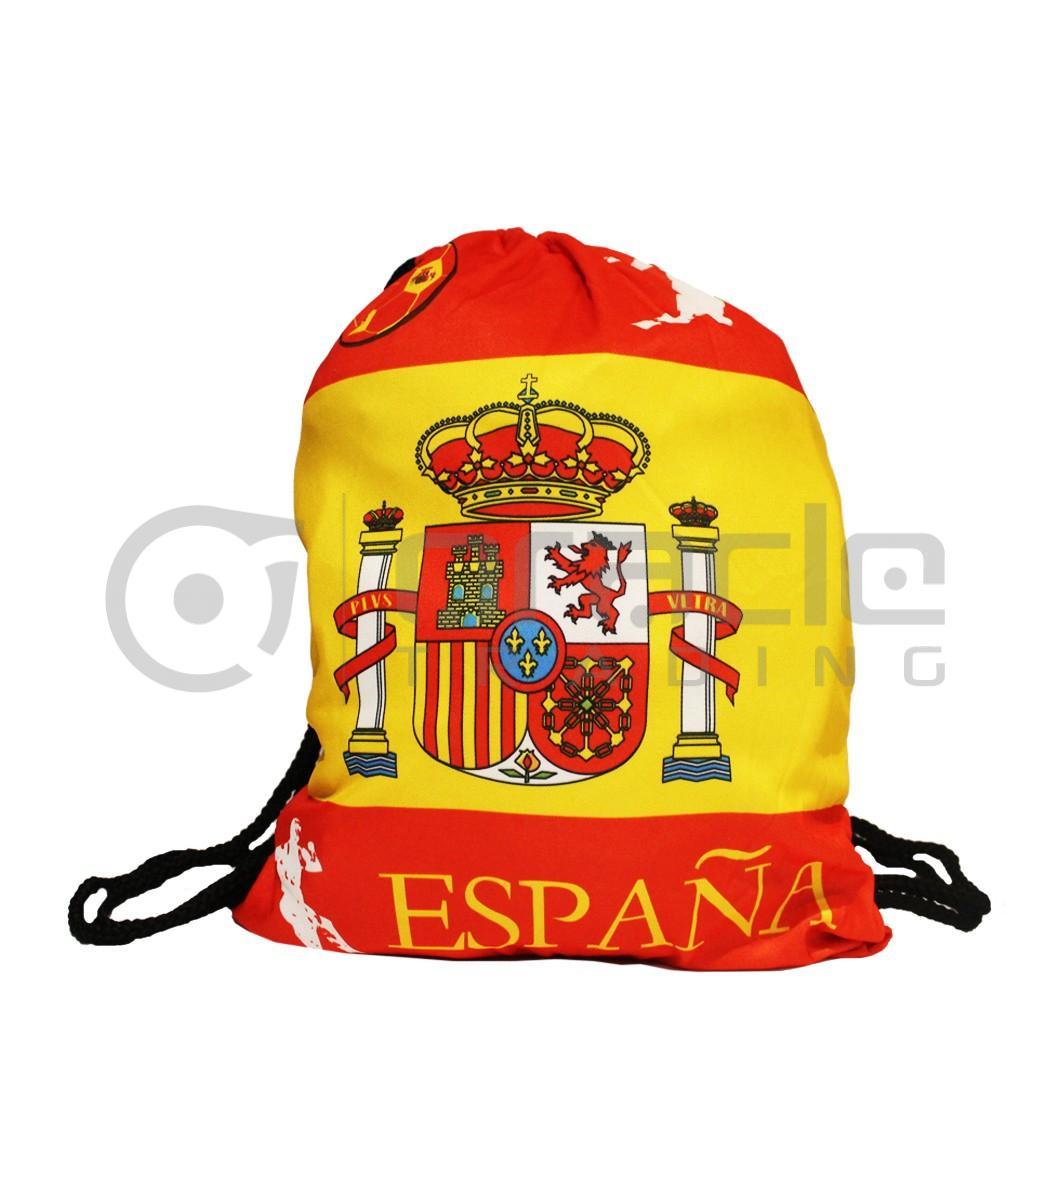 Spain Gym Bag